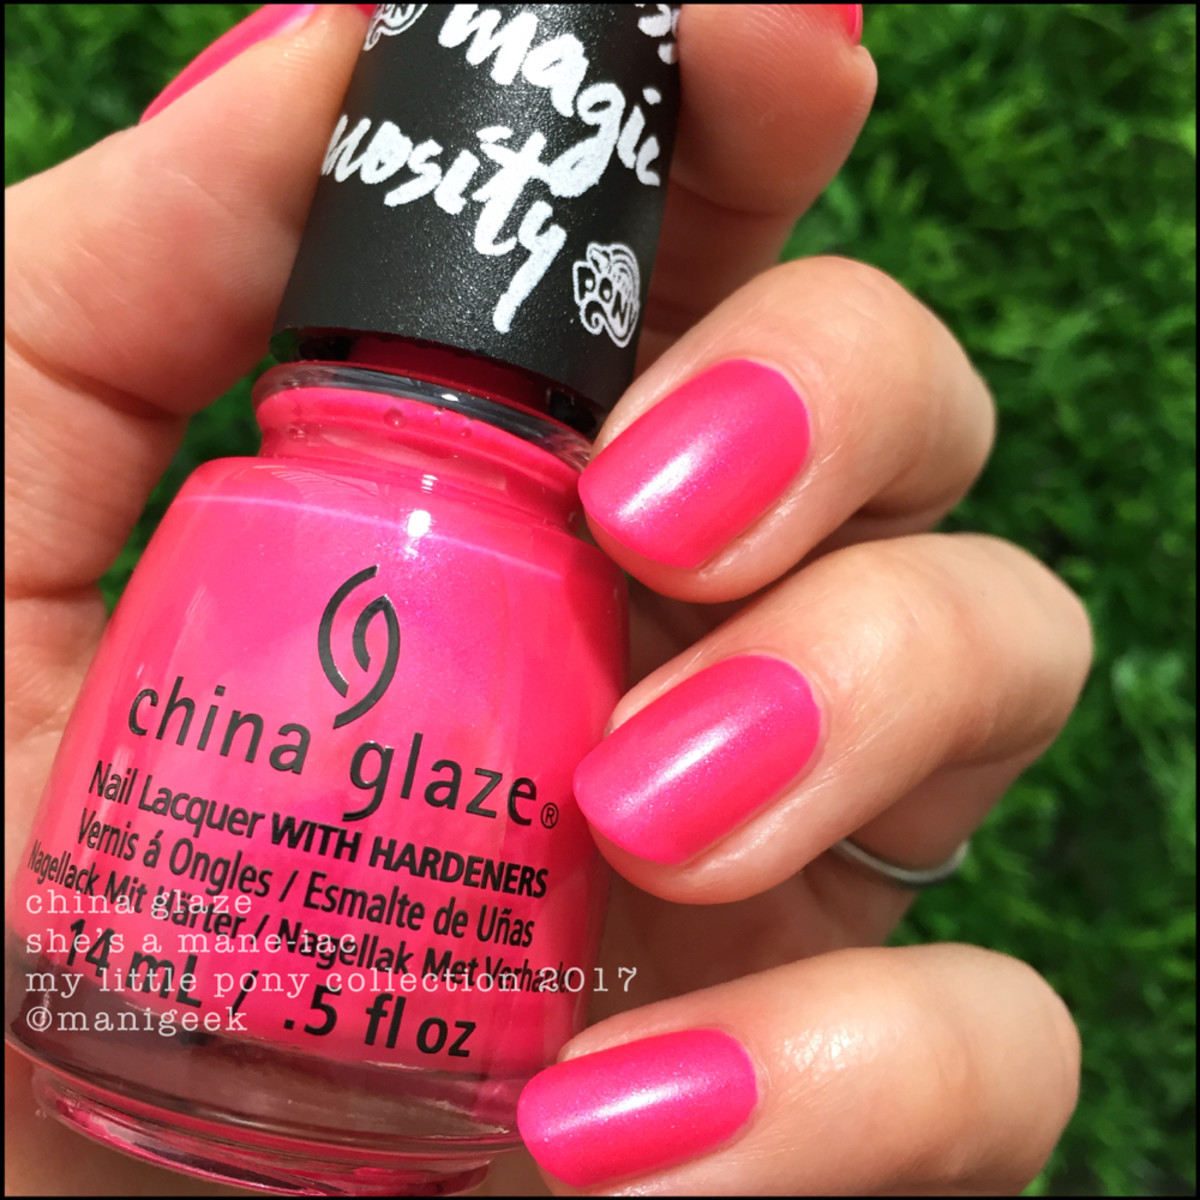 China Glaze She's a Mane-iac - My Little Pony Collection 2017